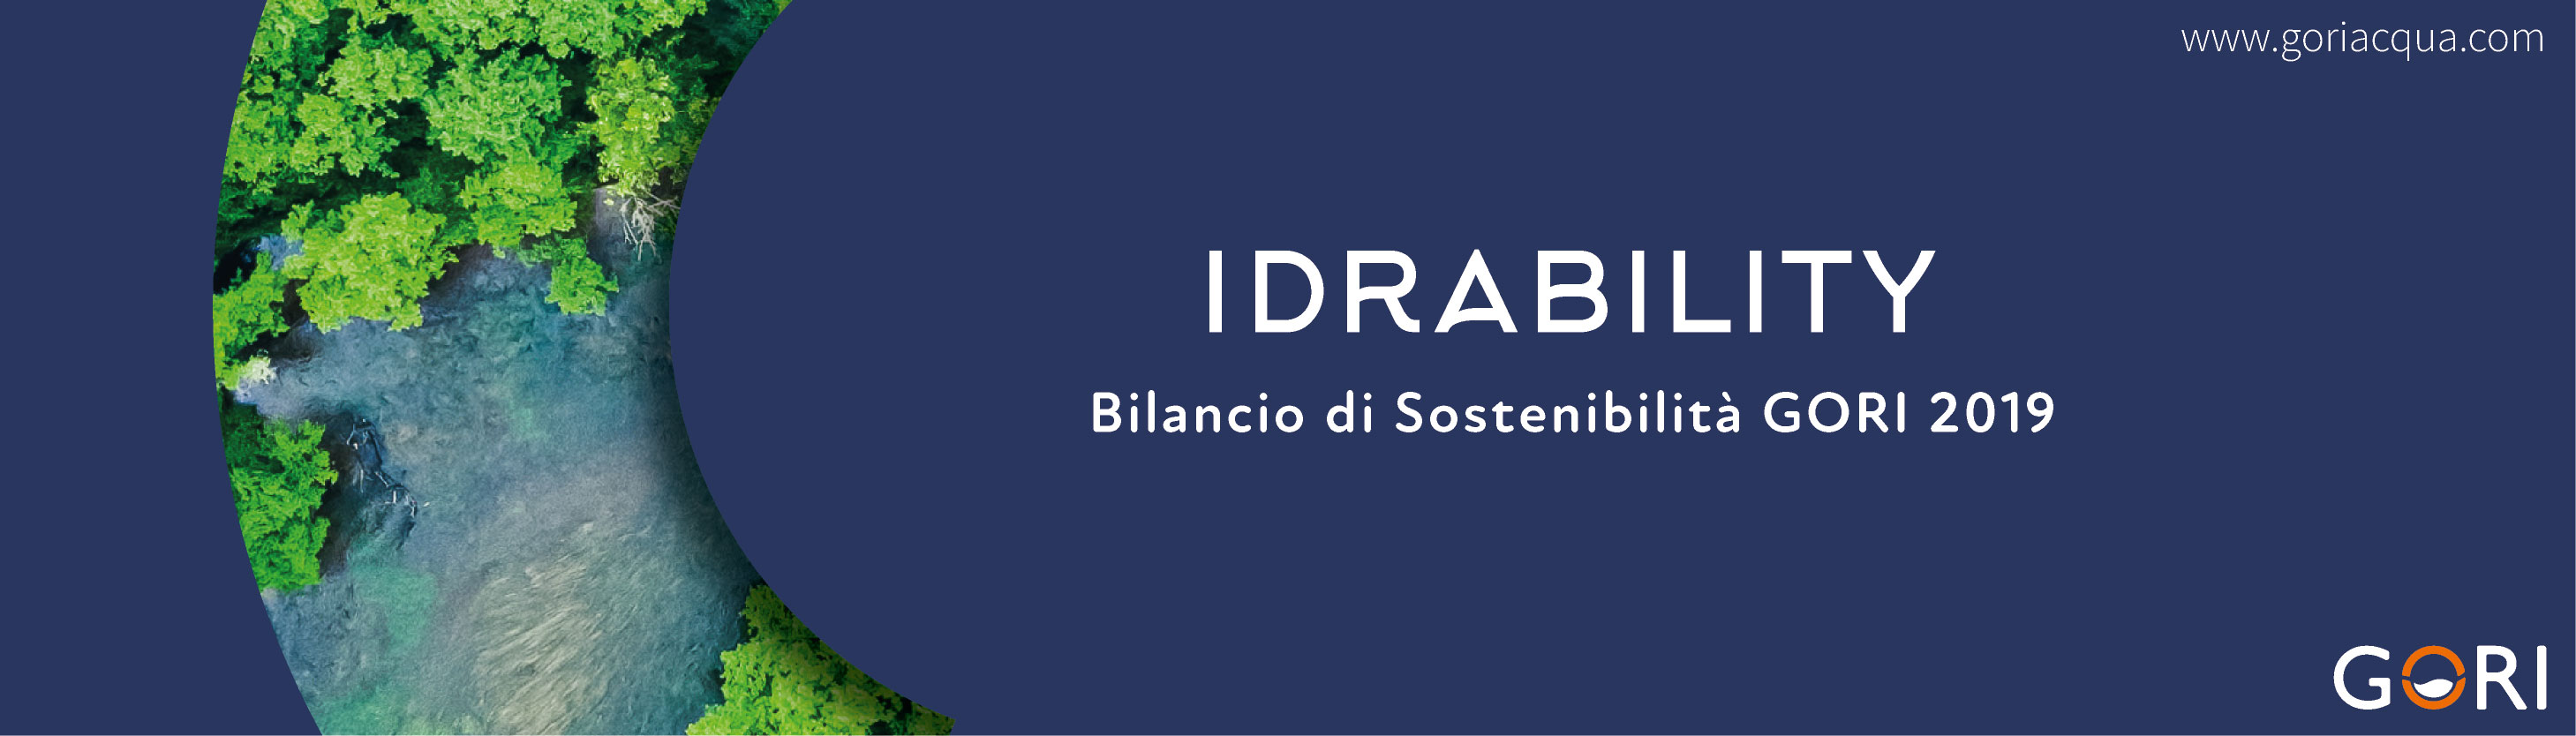 Banner Gori Idrability